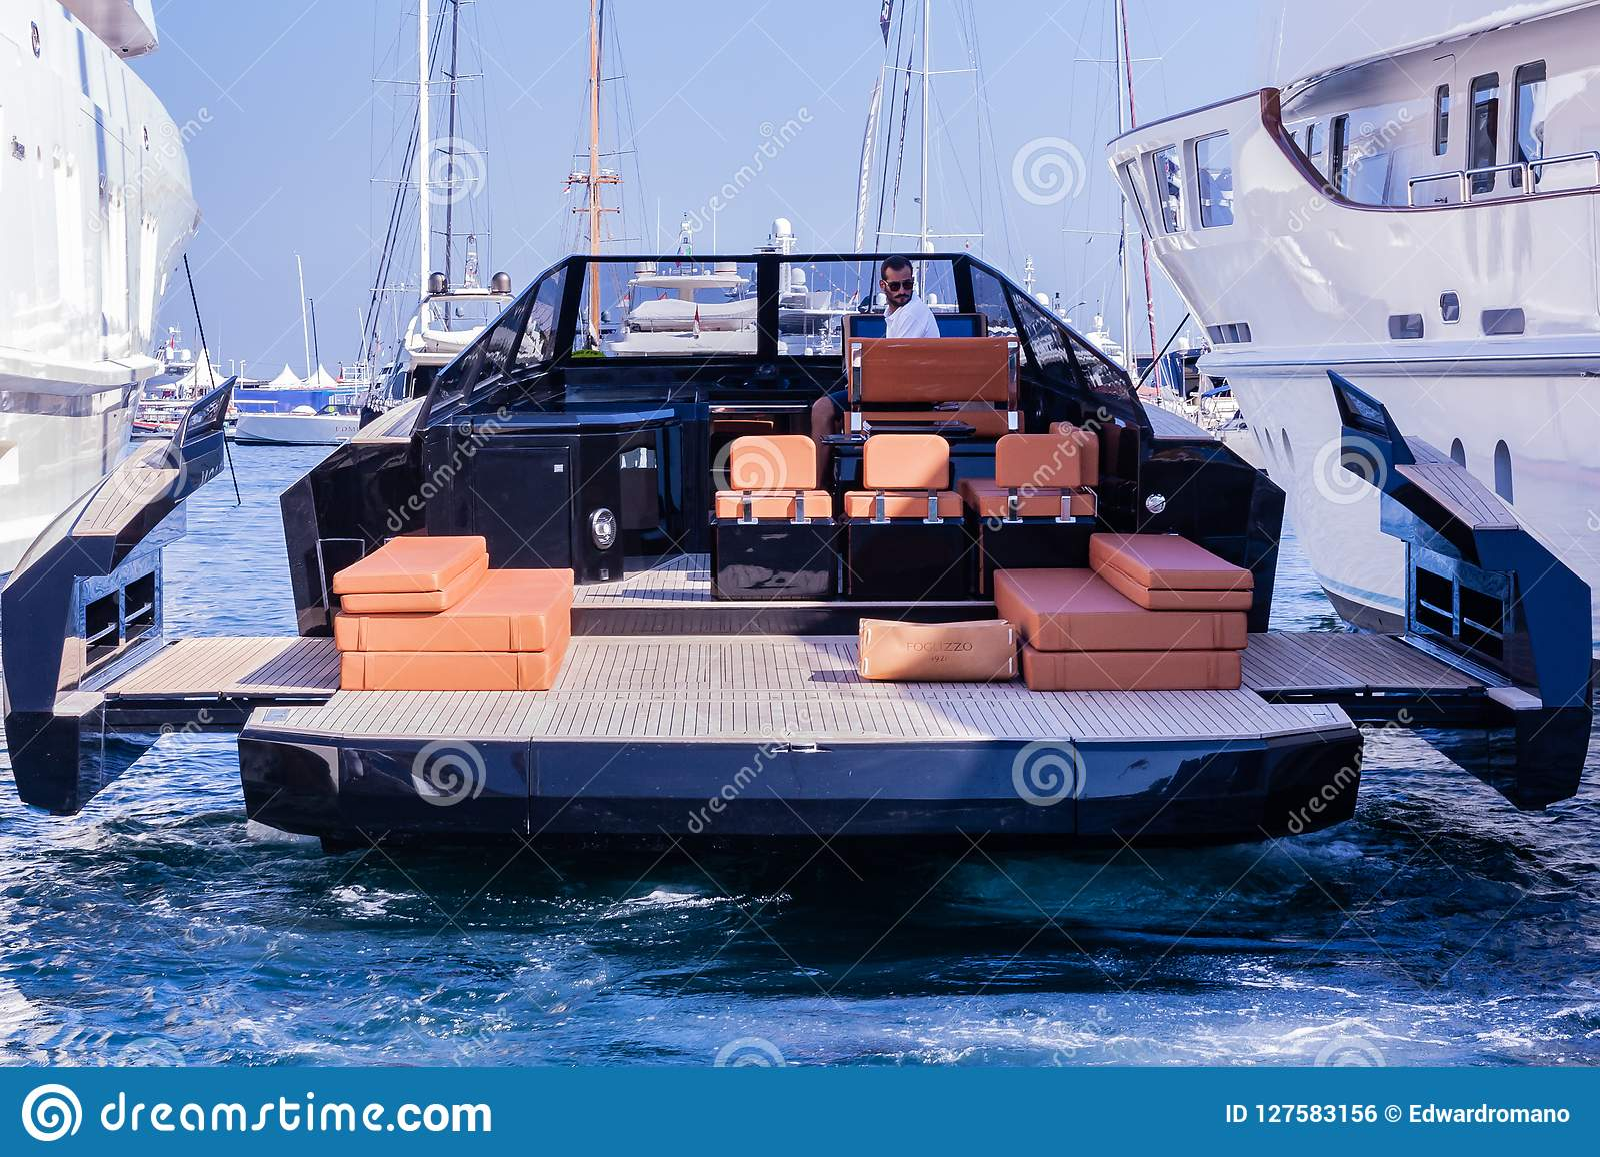 Luxury Yachts, Monaco Yacht Show 2018  Monte-Carlo, France